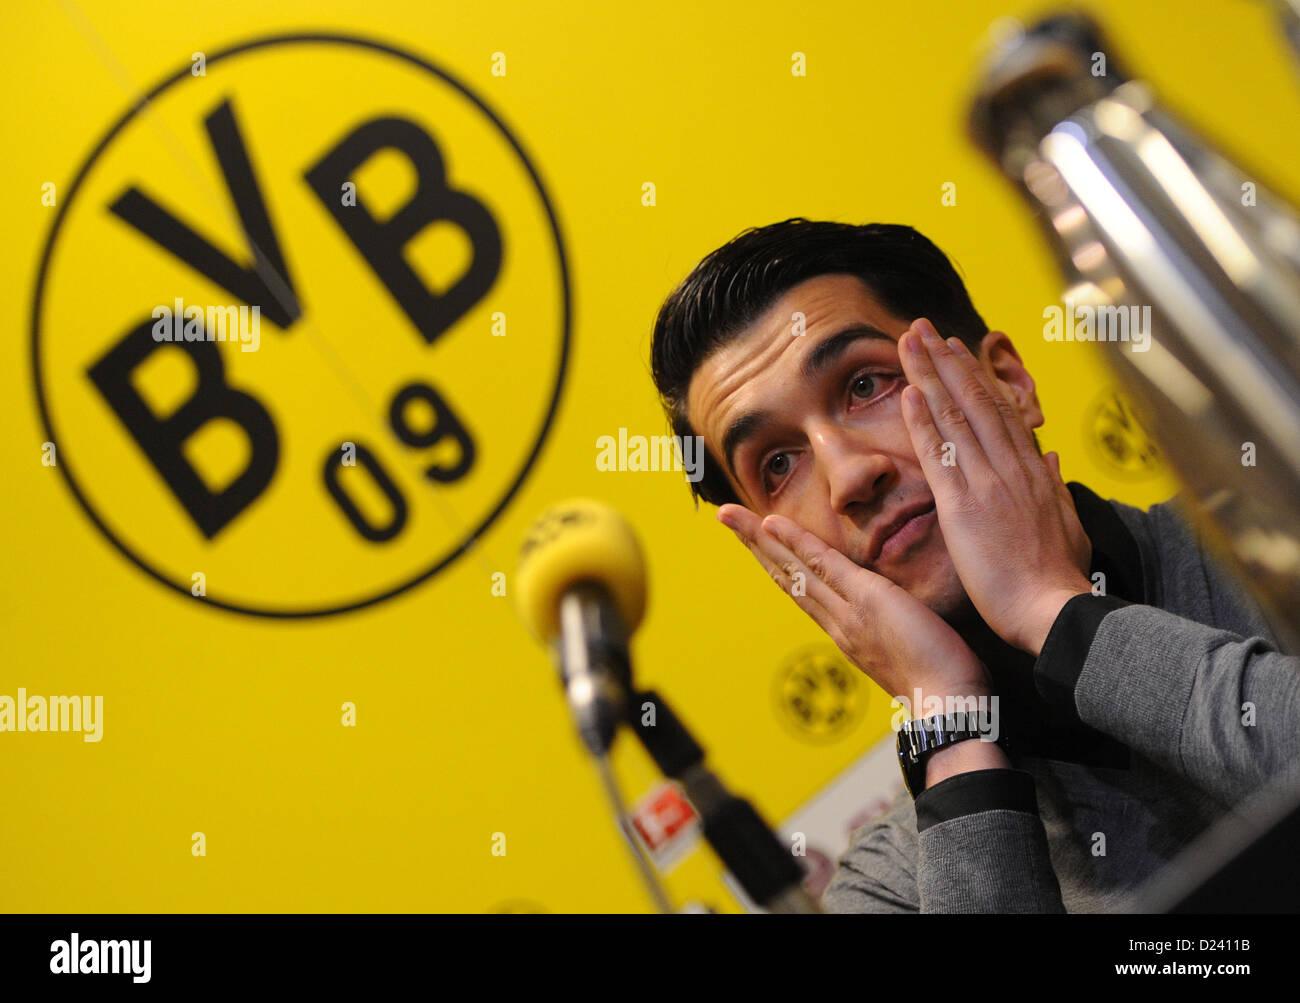 Professional soccer player Nuri Sahin is presented as the new acquisition of Bundesliga soccer club Borussia Dortmund Stock Photo